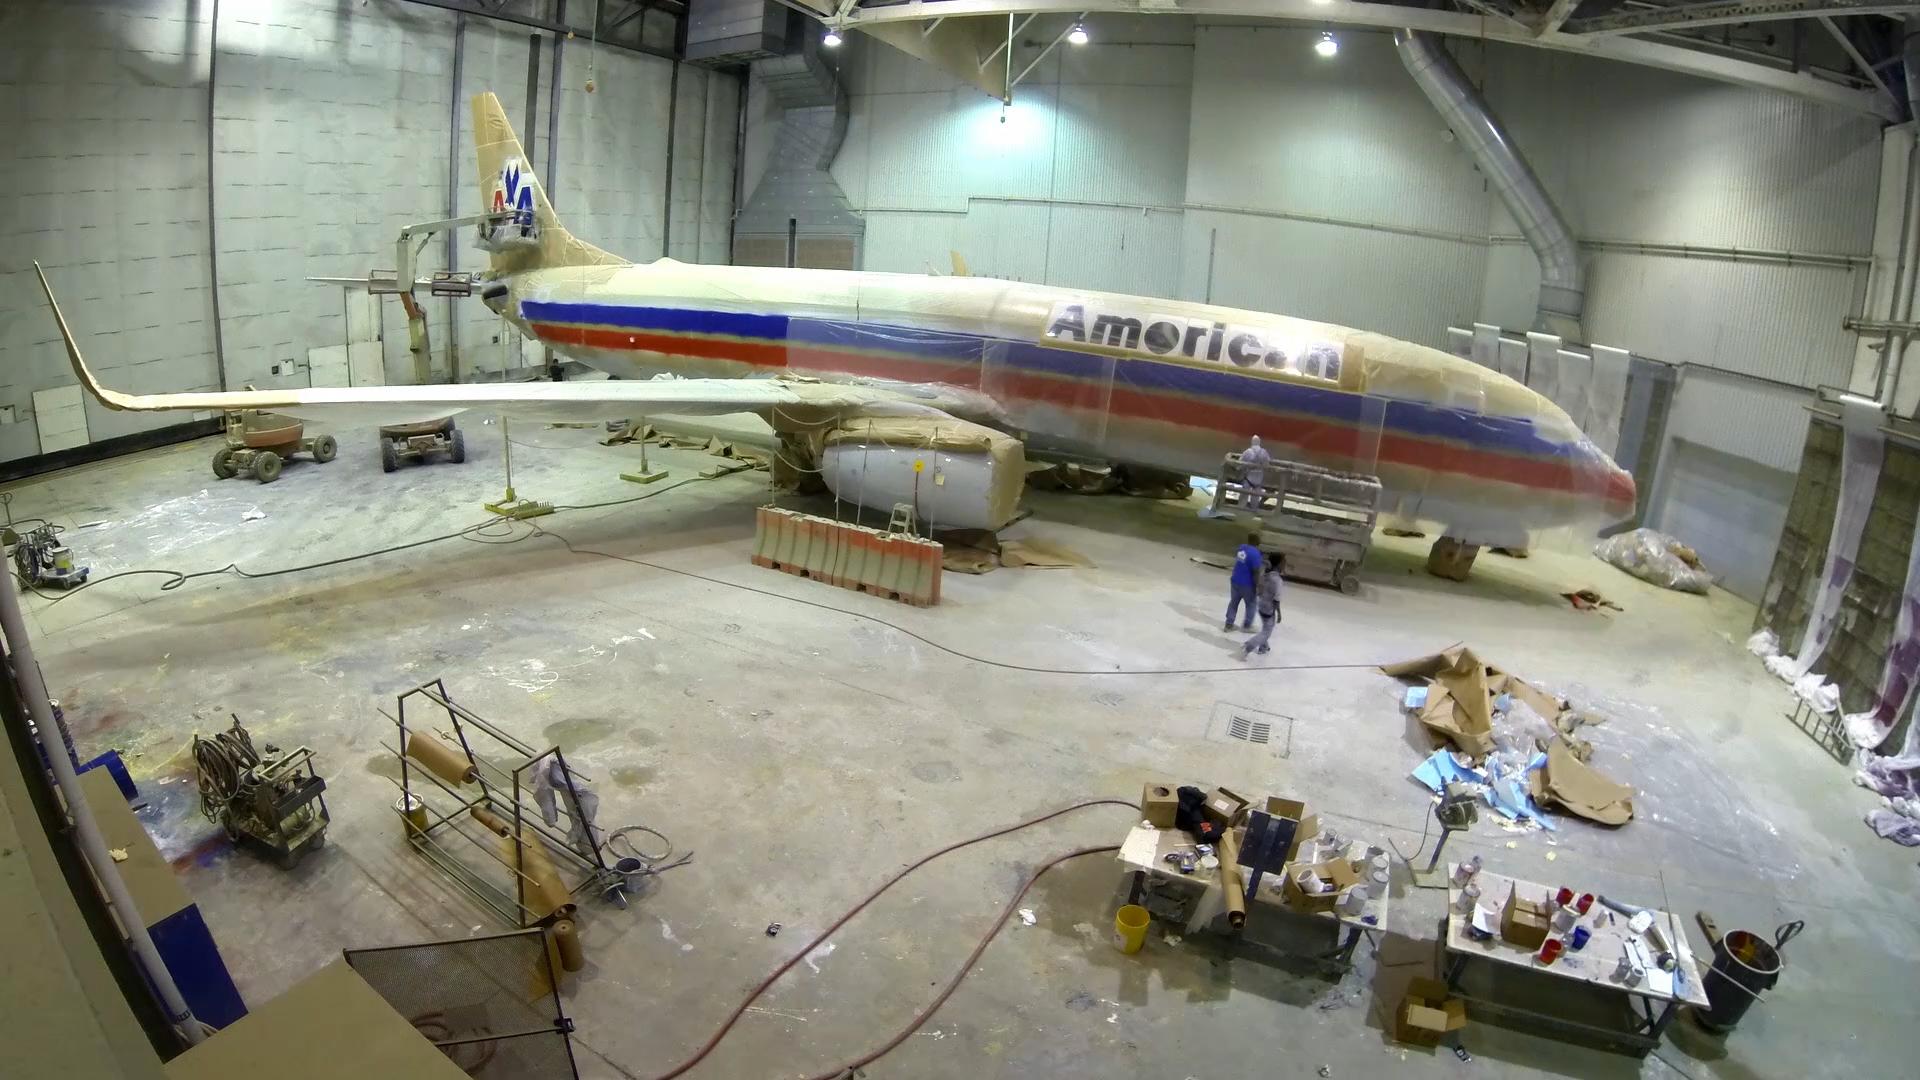 AA Plane thumbnail0.jpg